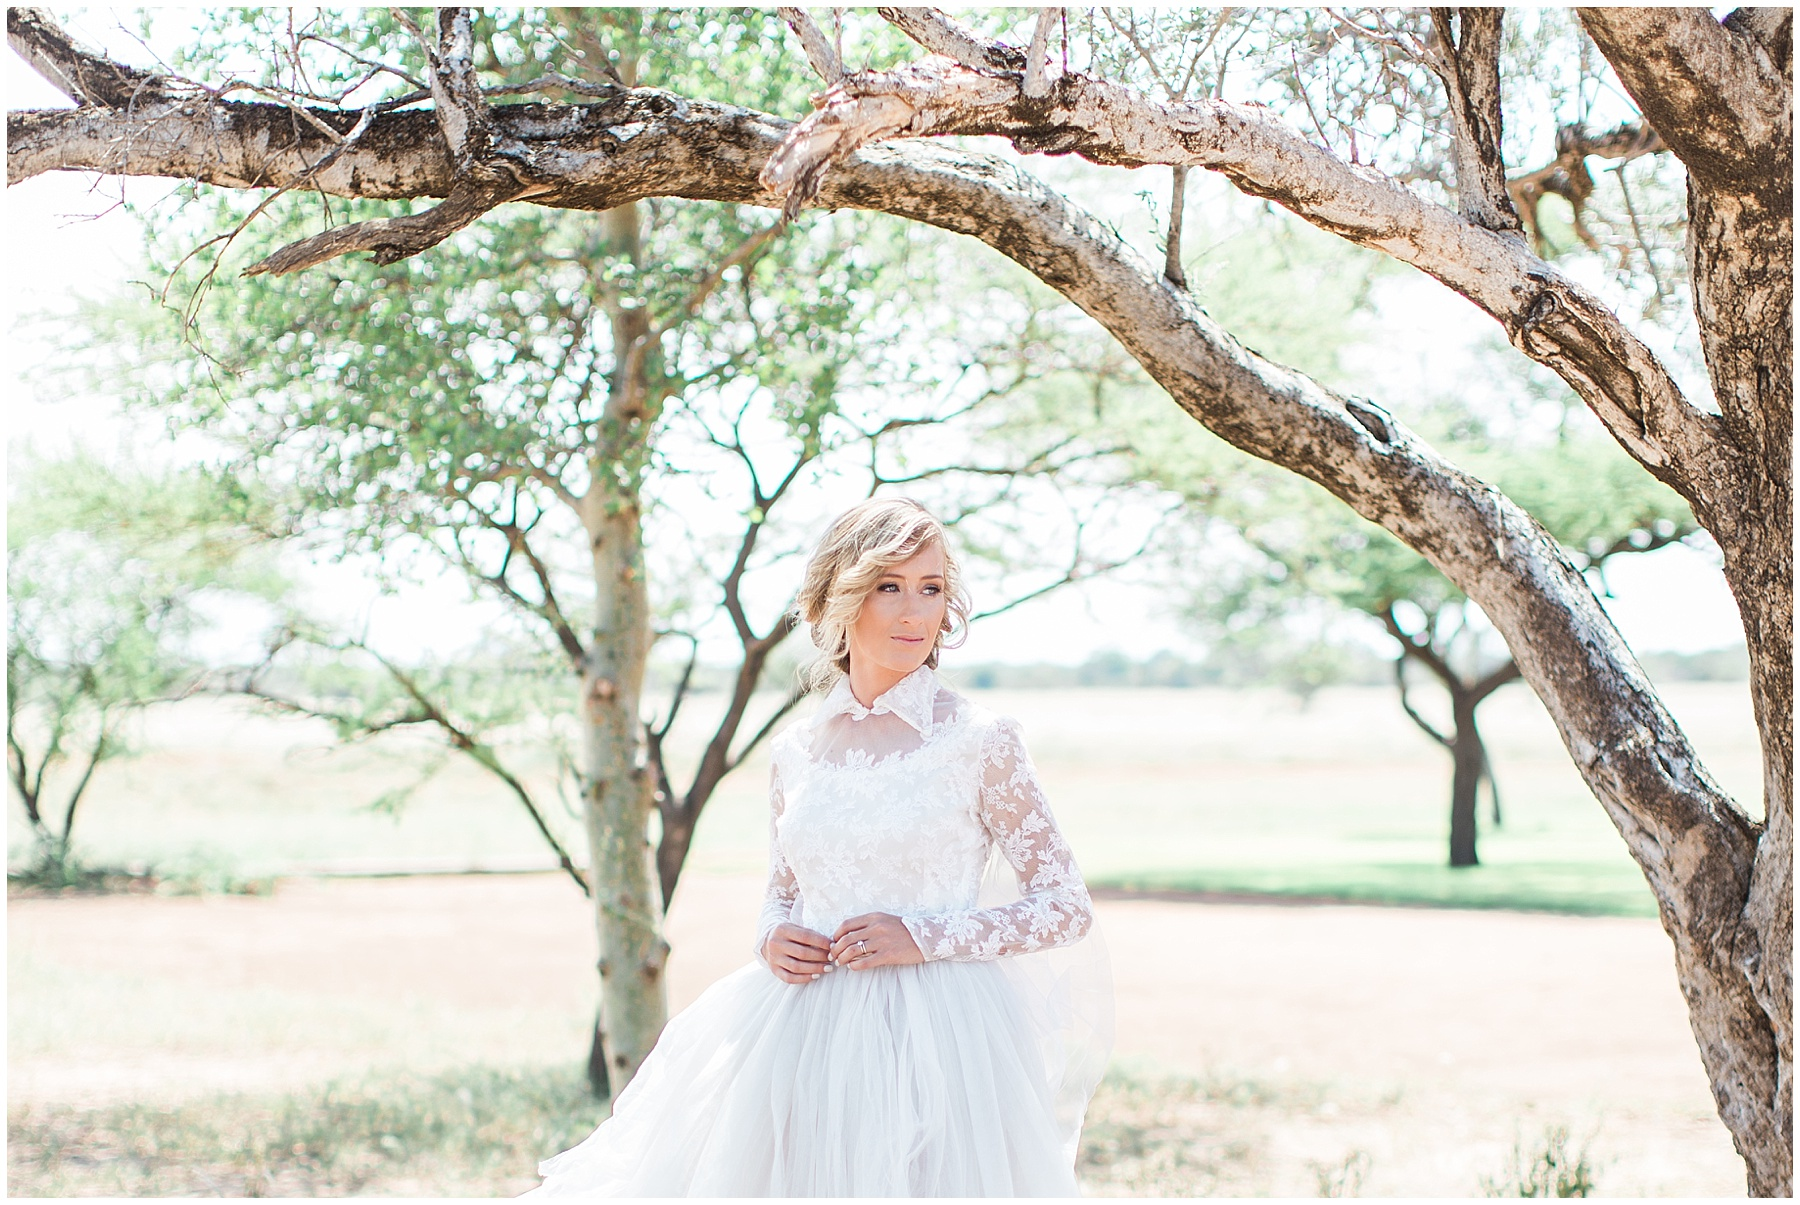 AliciaLandman_JoleneandZander_Wedding_The Pretty Blog_0436.jpg